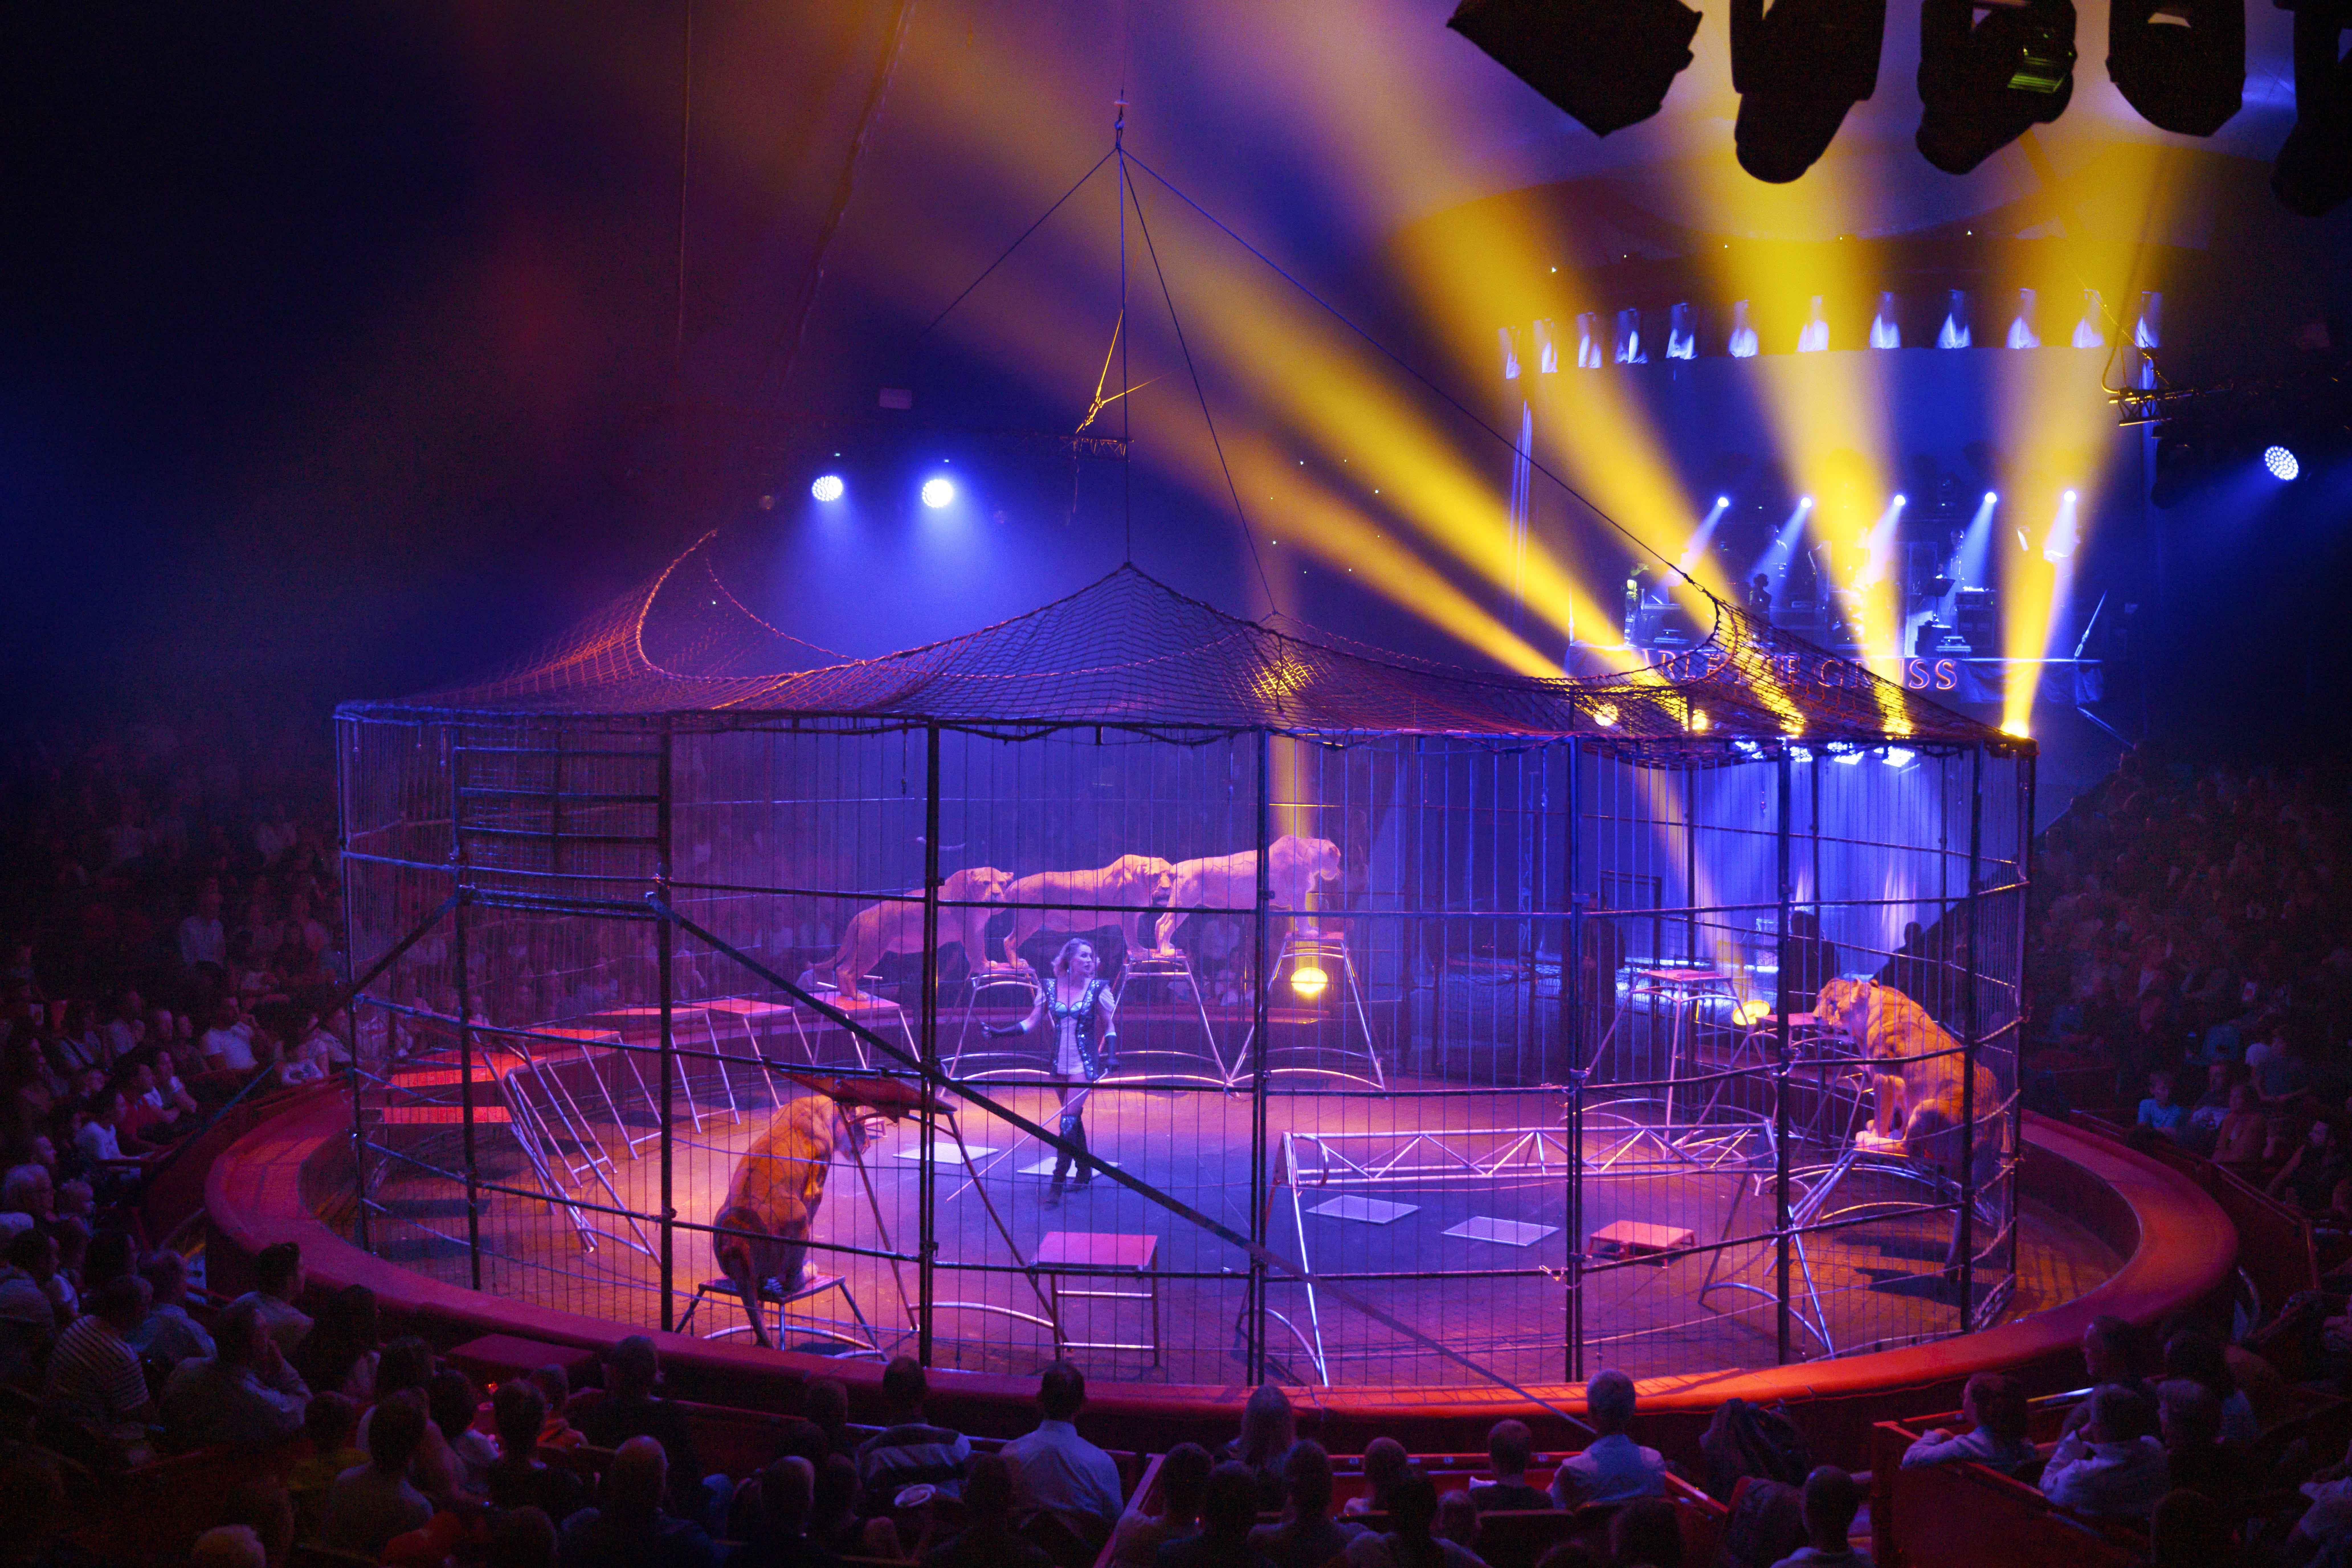 Roofdieren Arlette Gruss op Circusweb